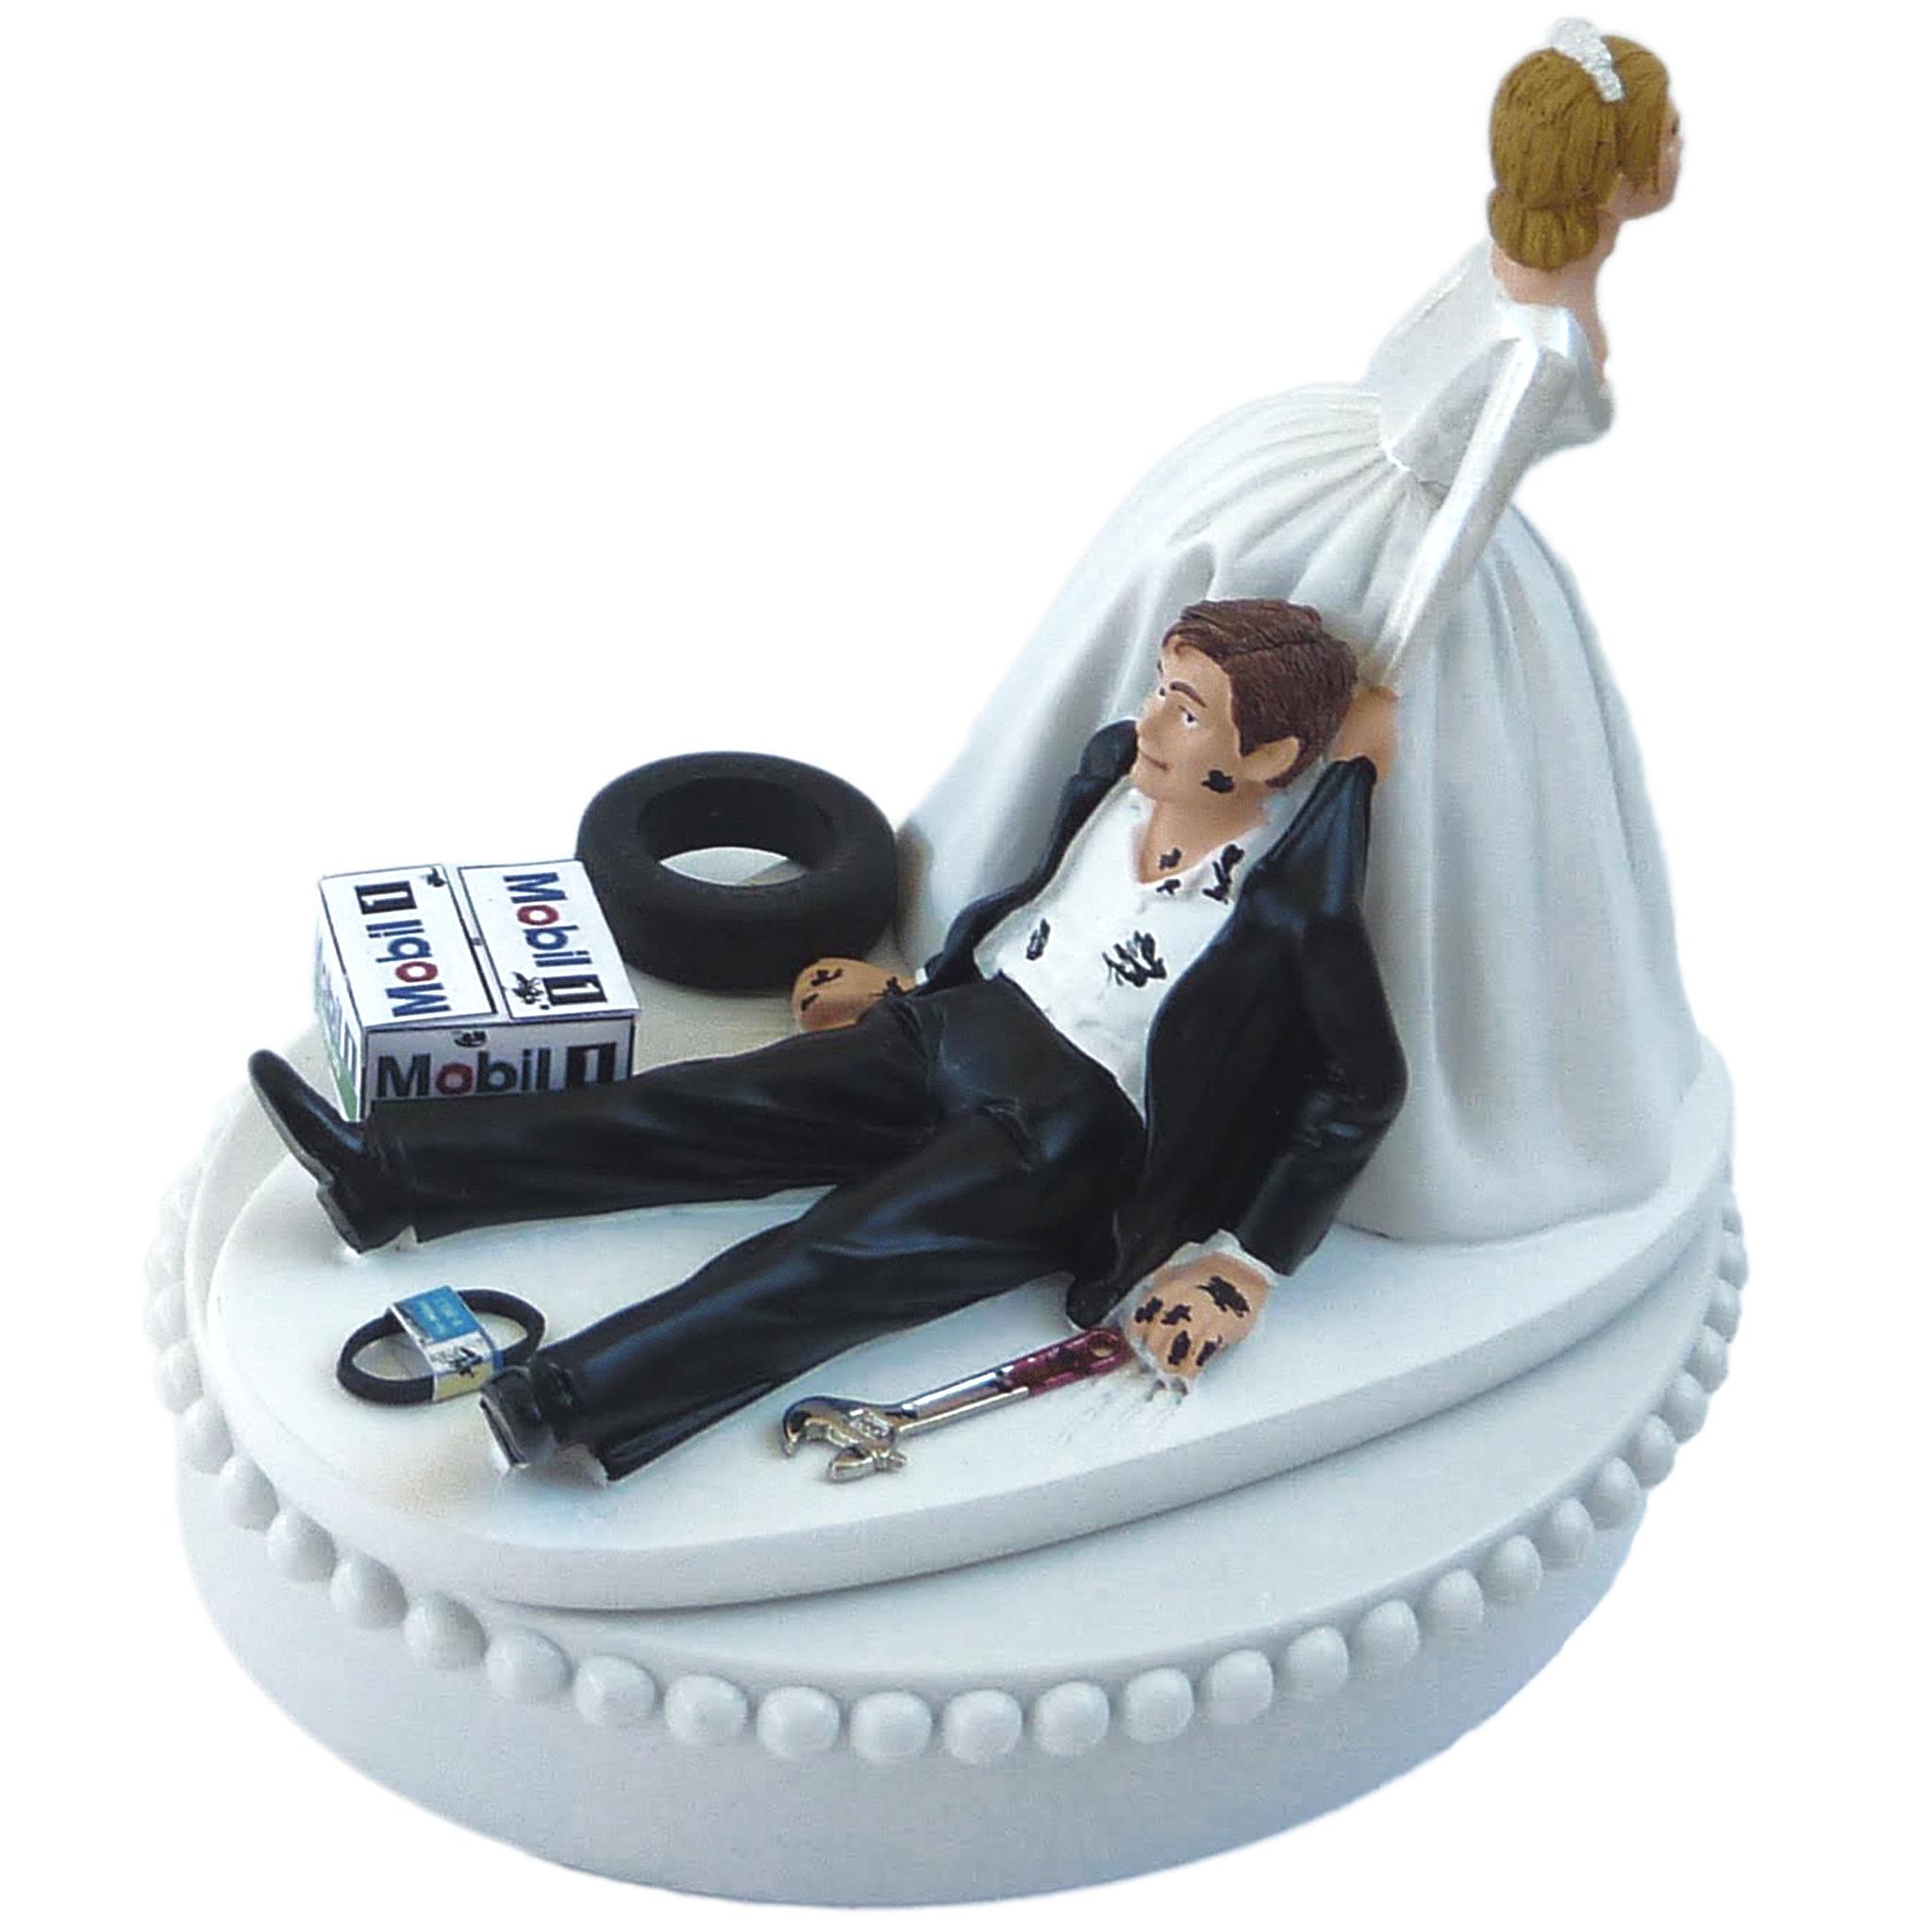 Funny Wedding Garters: FunWeddingThings.com Offers Funny And Frilly Wedding Cake